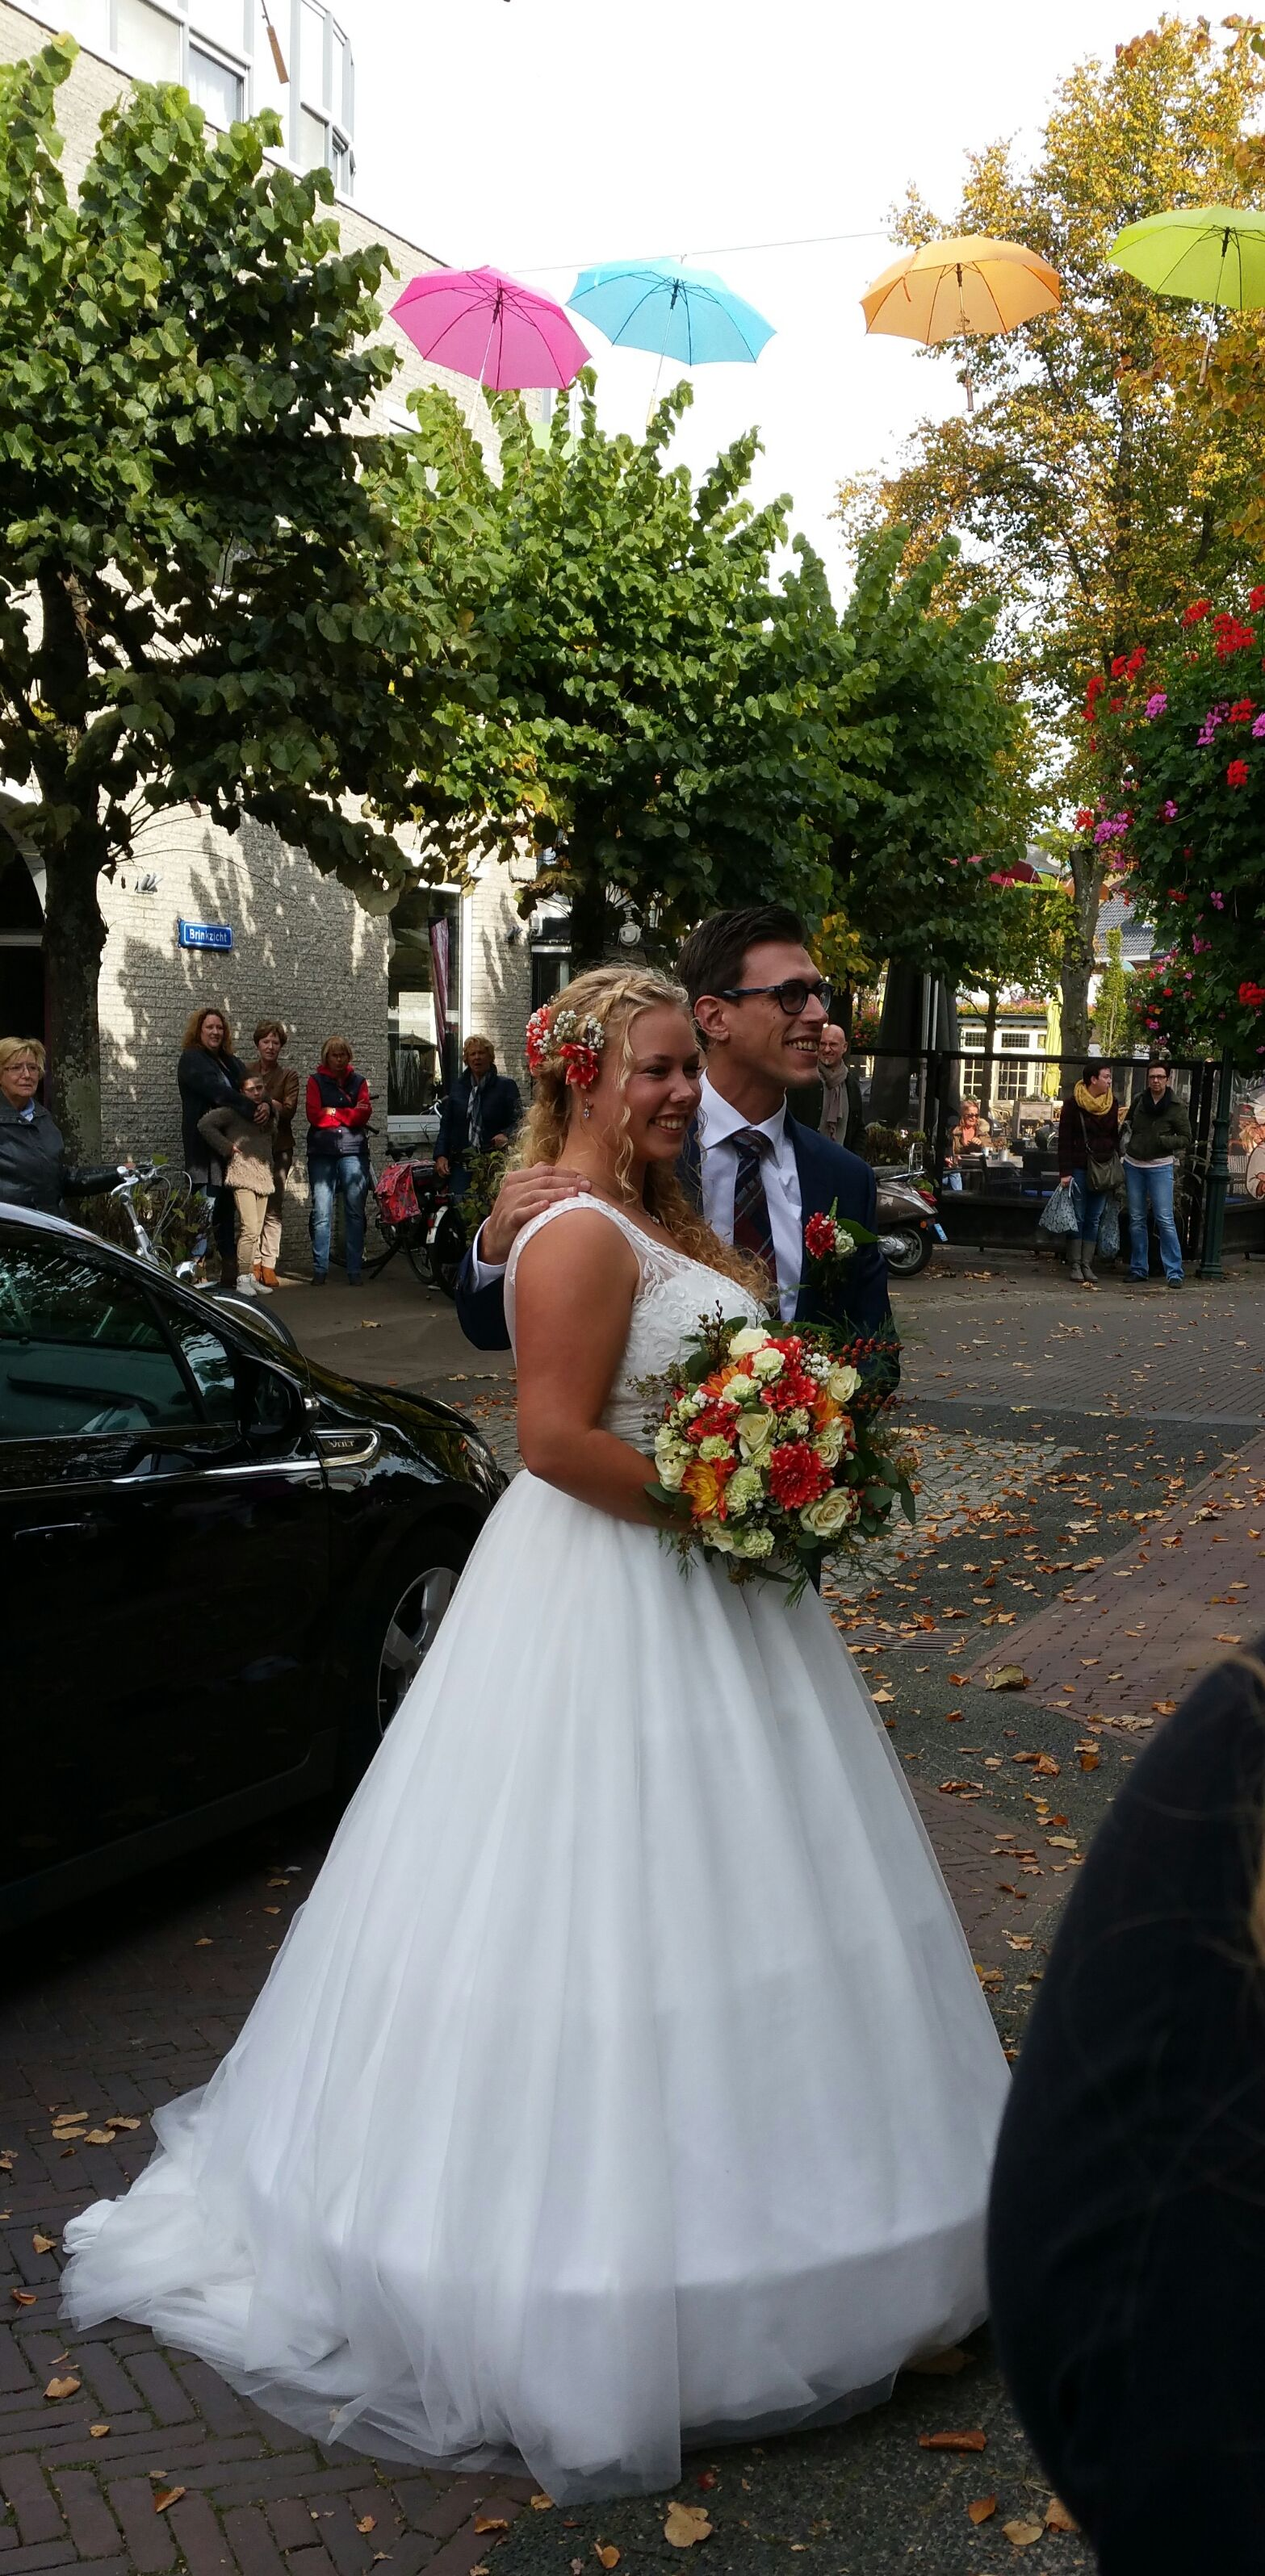 Bruid Marijke uit Baarn ook haar wimperextensions gedaan http://www.hairclusief.nl